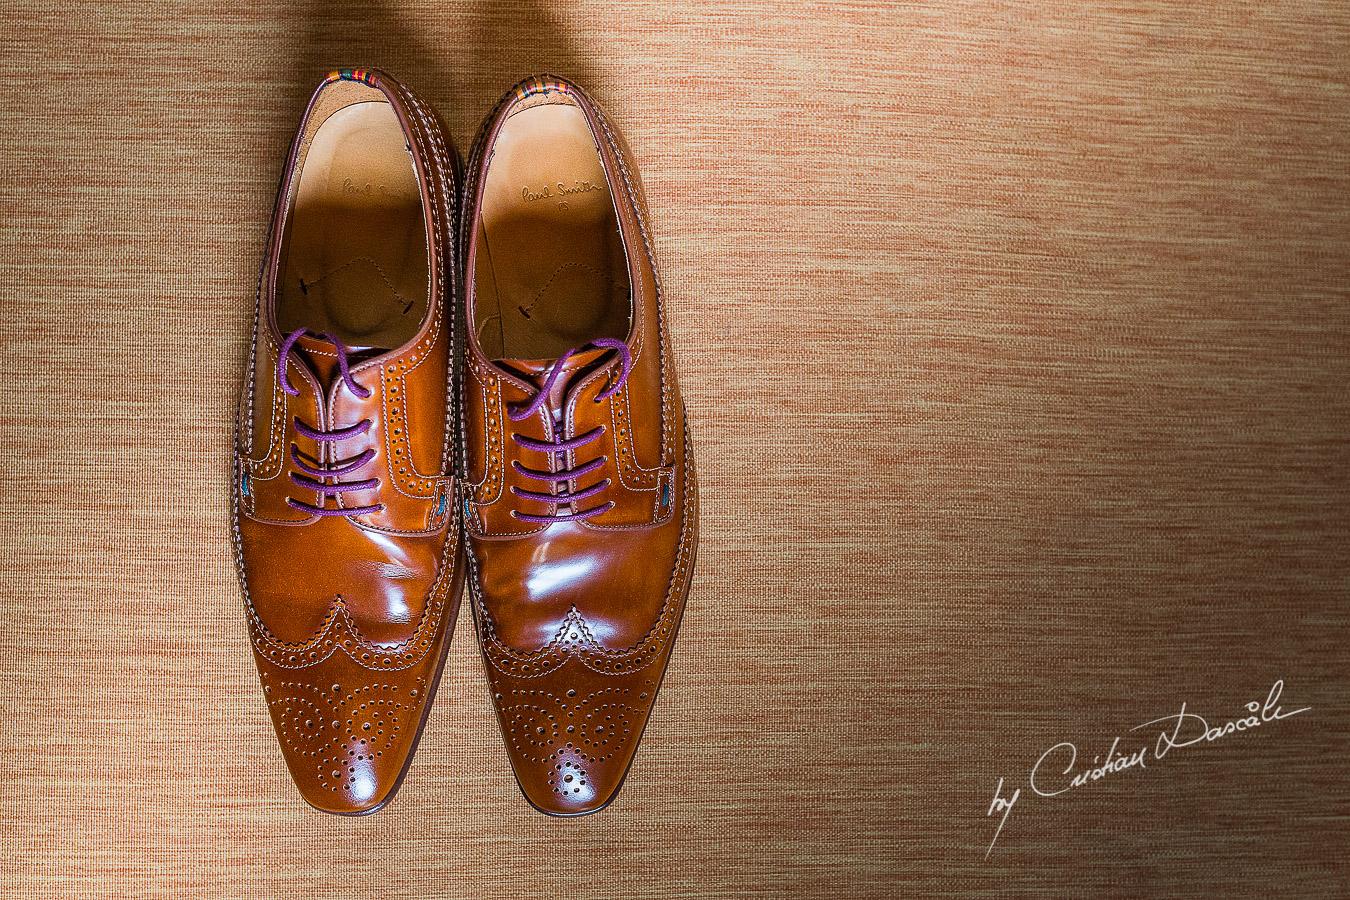 Groom's shoes captured at Elysium Hotel in Paphos, Cyprus.